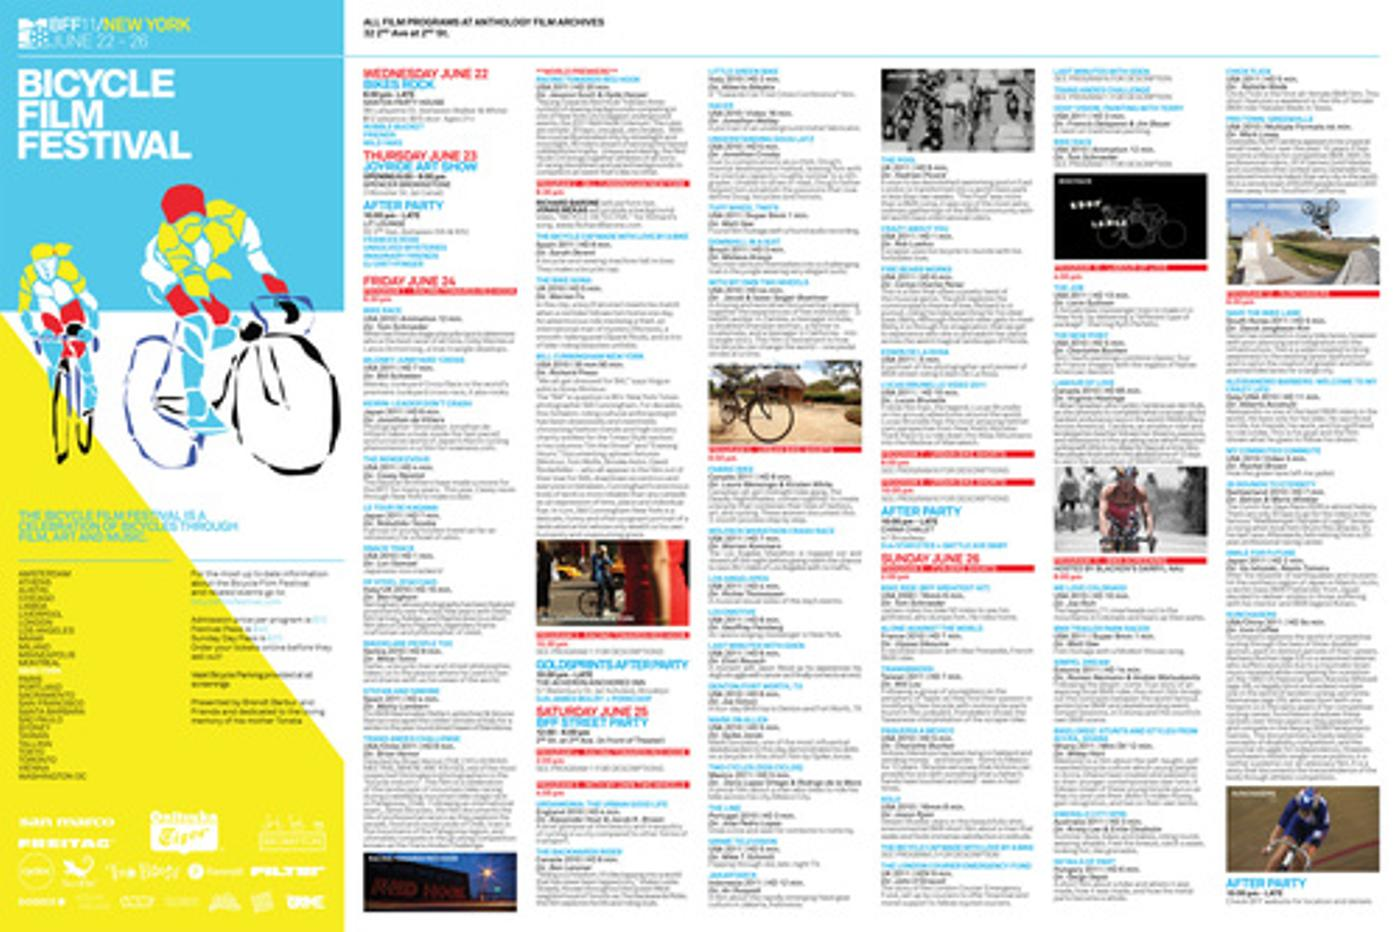 BFFNYC2011-02.jpg